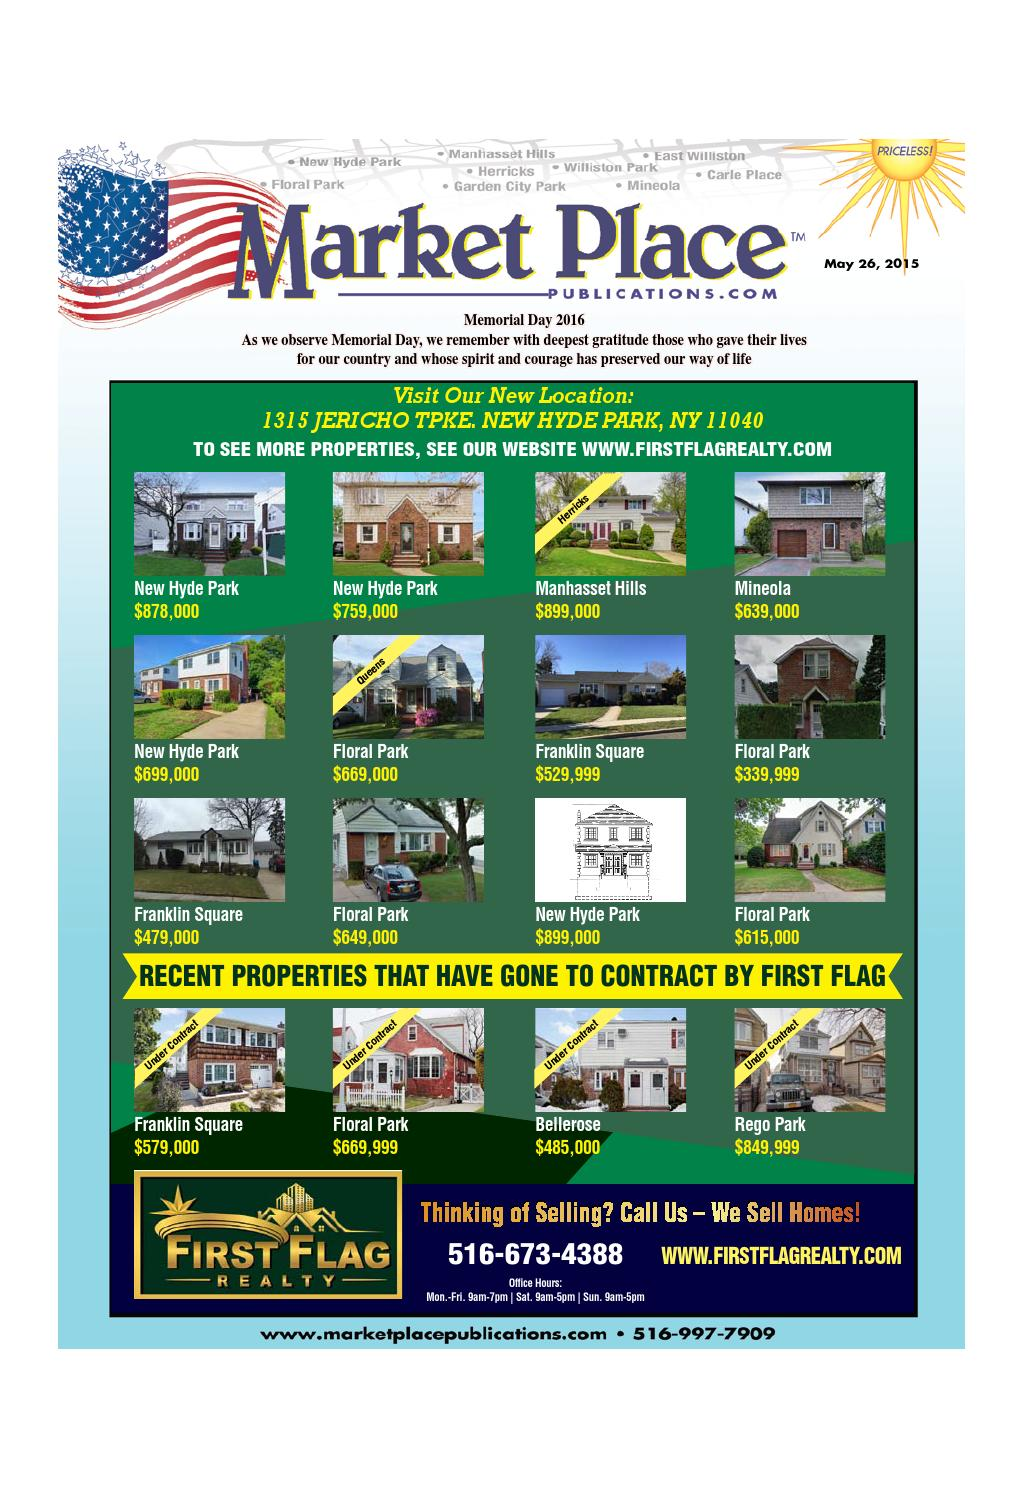 Webads 5 26 16 by marketplacepublications issuu reheart Images